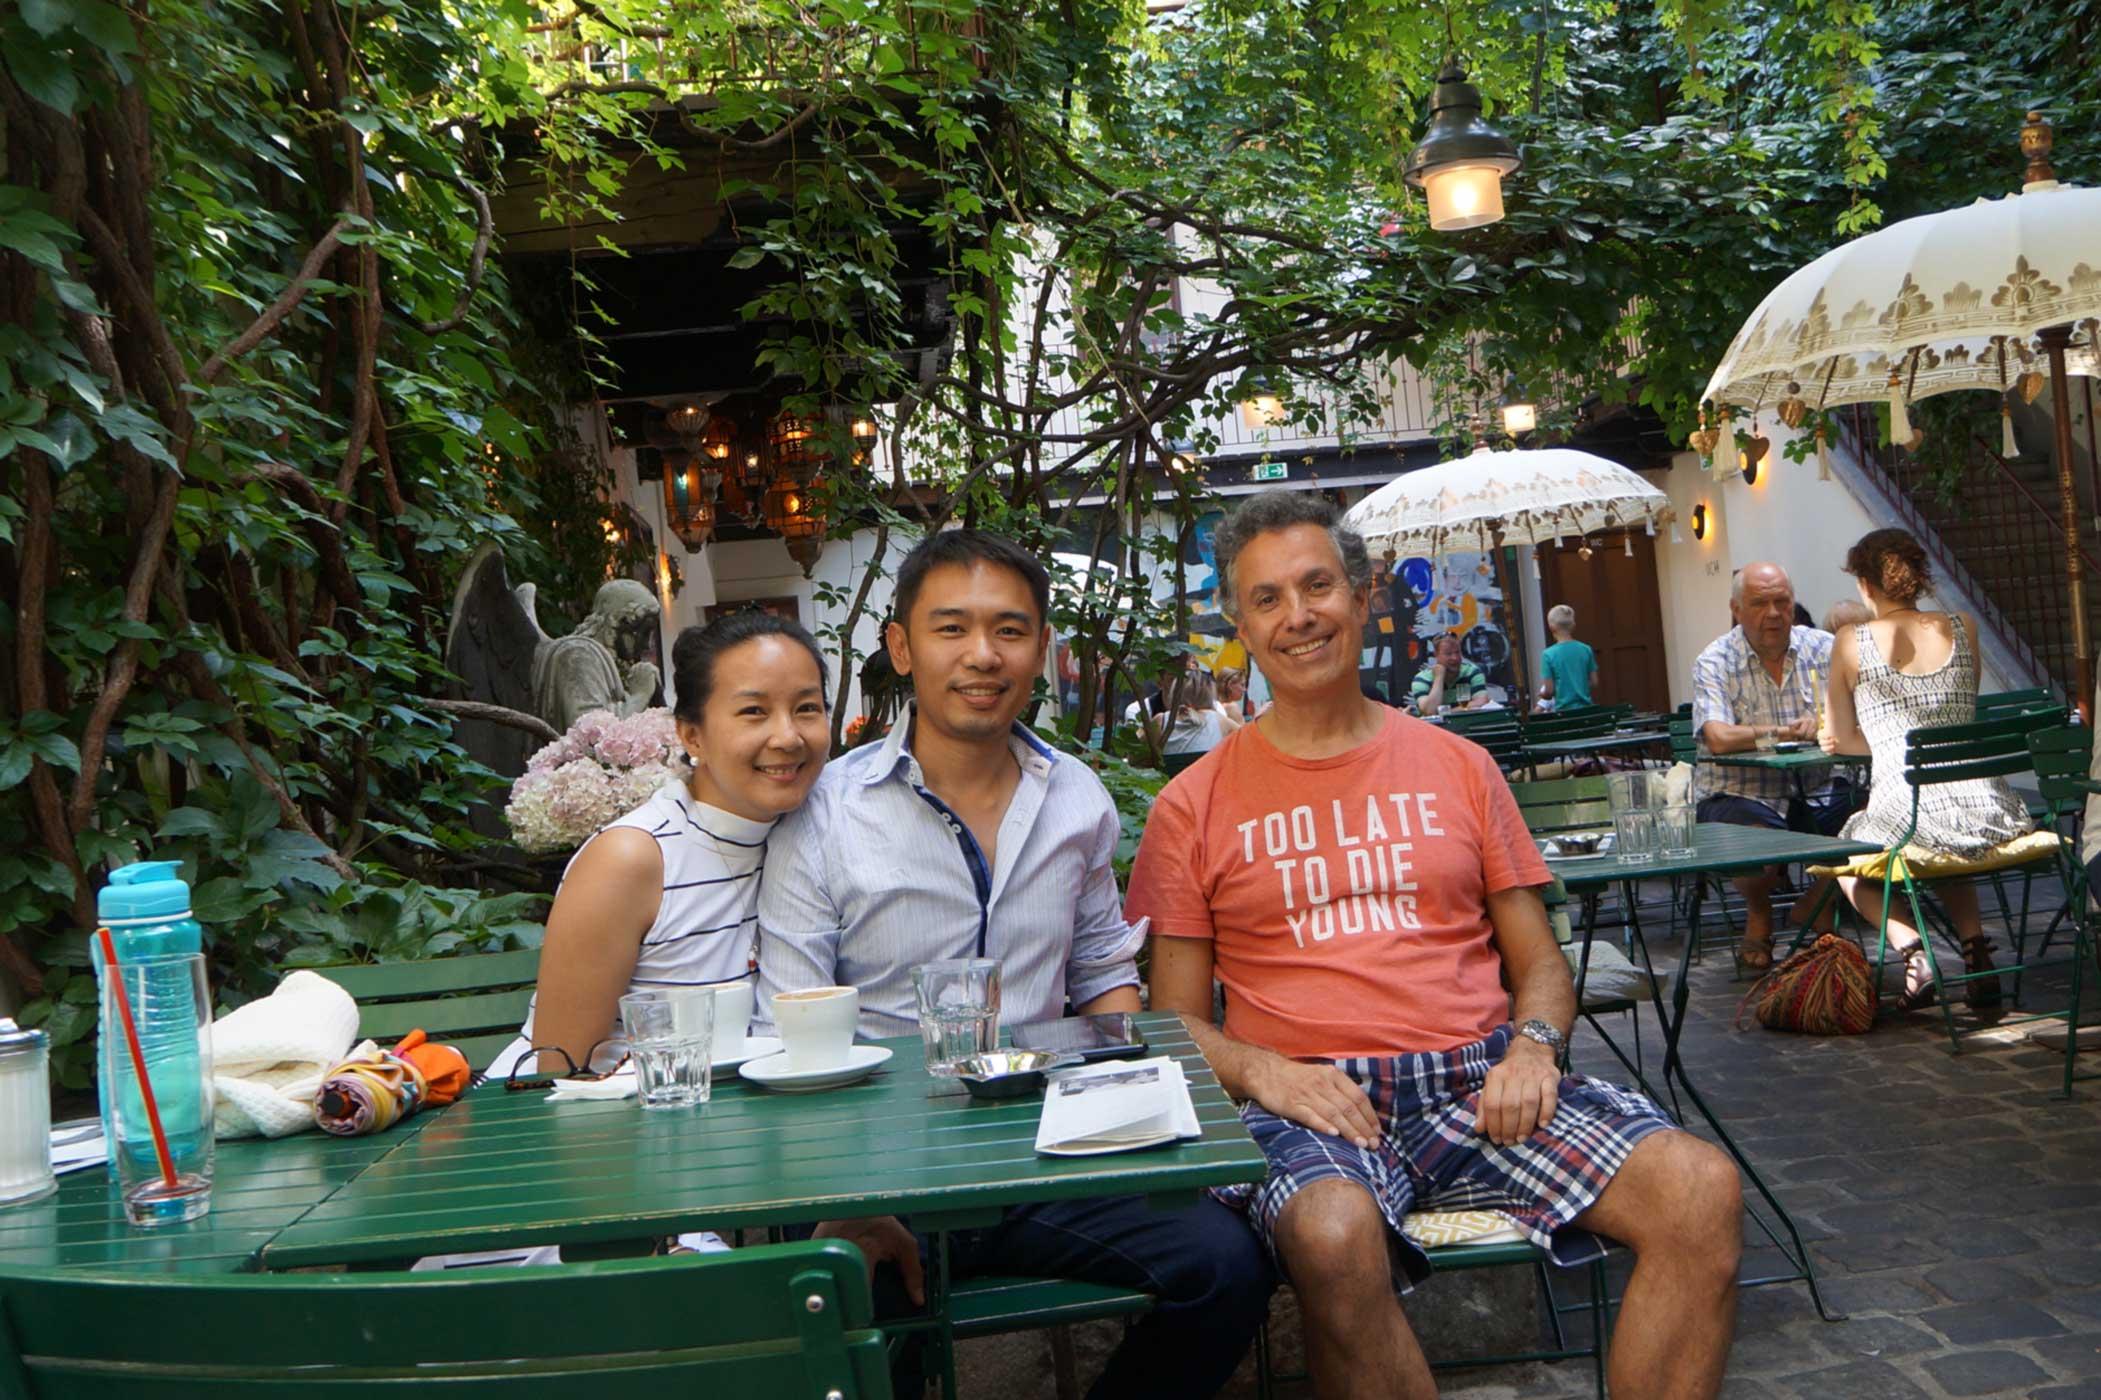 On a summertime walk in Vienna